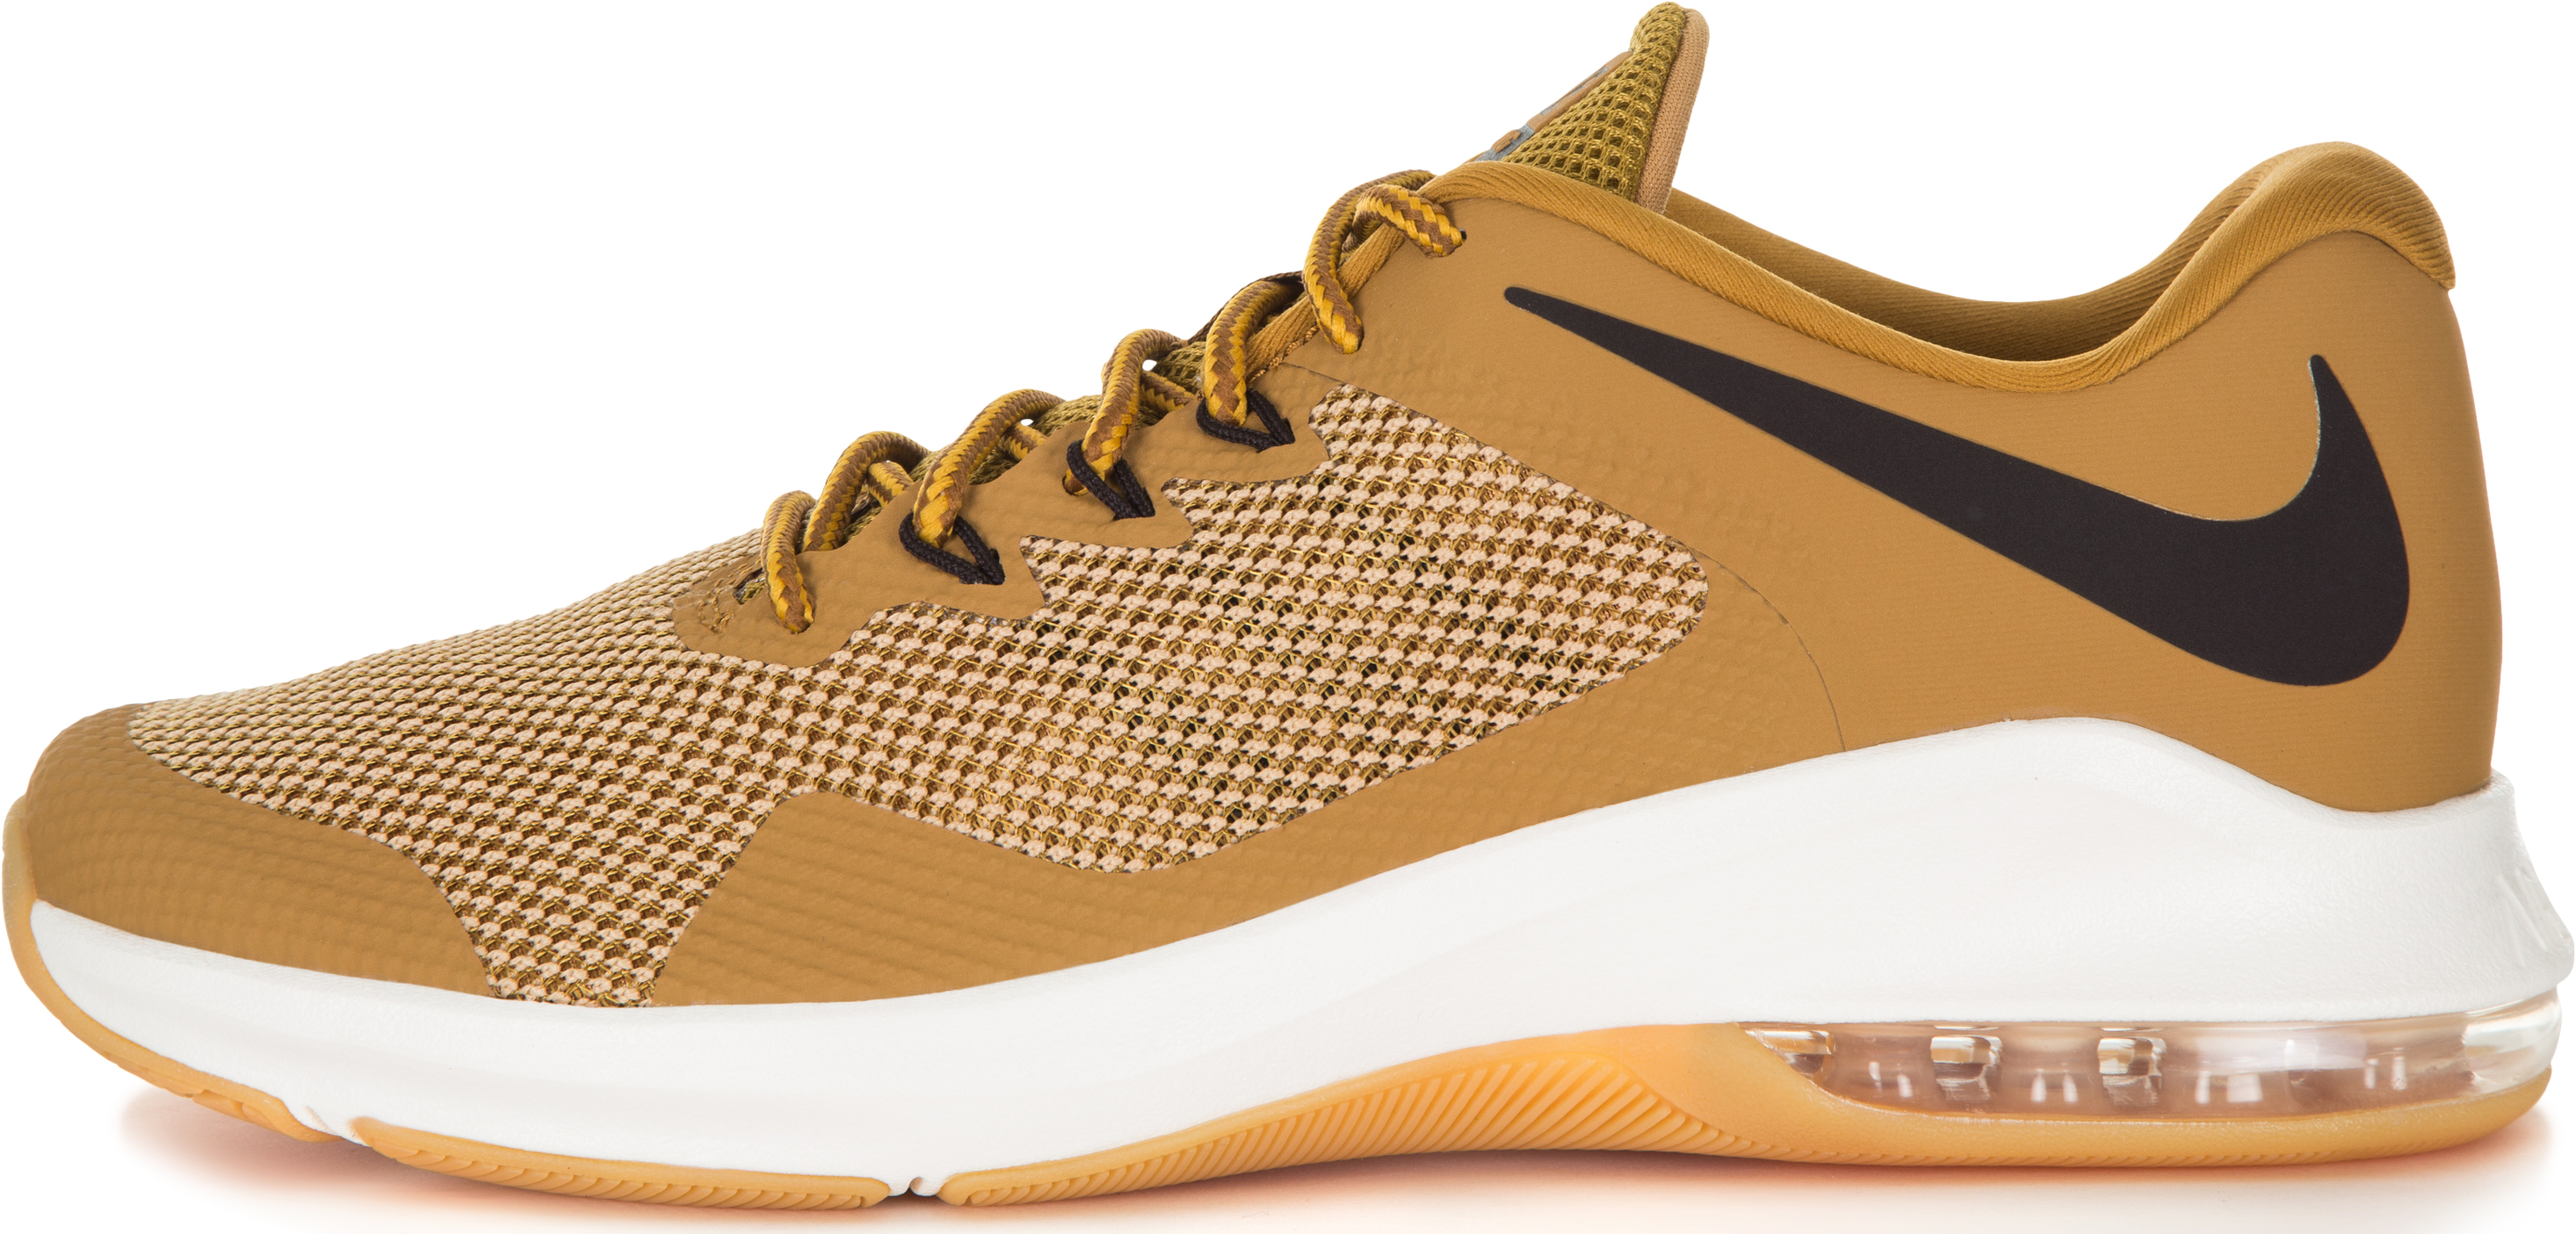 Nike Кроссовки мужские Nike Air Max Alpha Trainer, размер 44